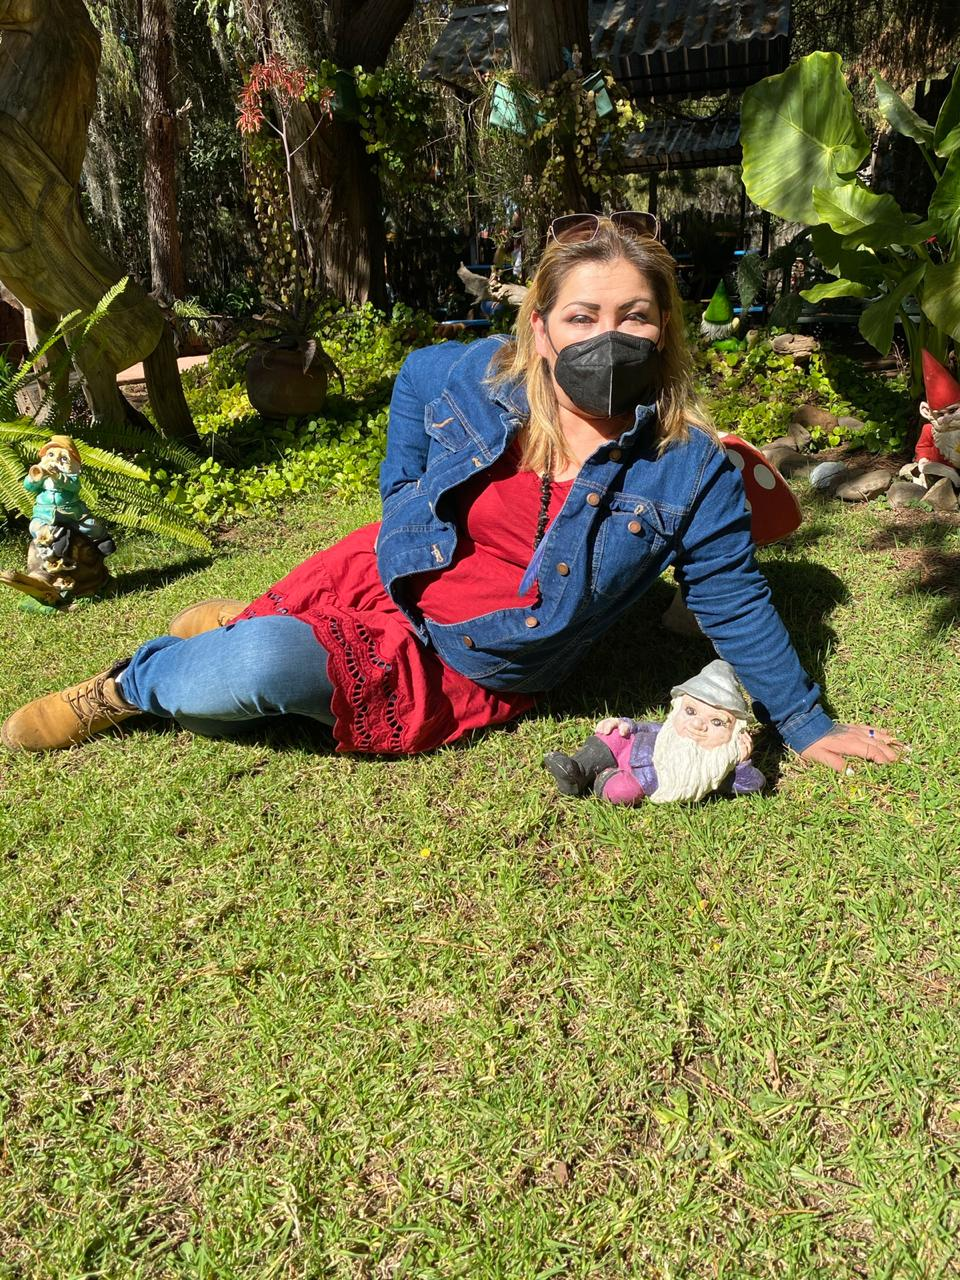 La historia de los duendes de Huasca de la mano de Gitana Perla